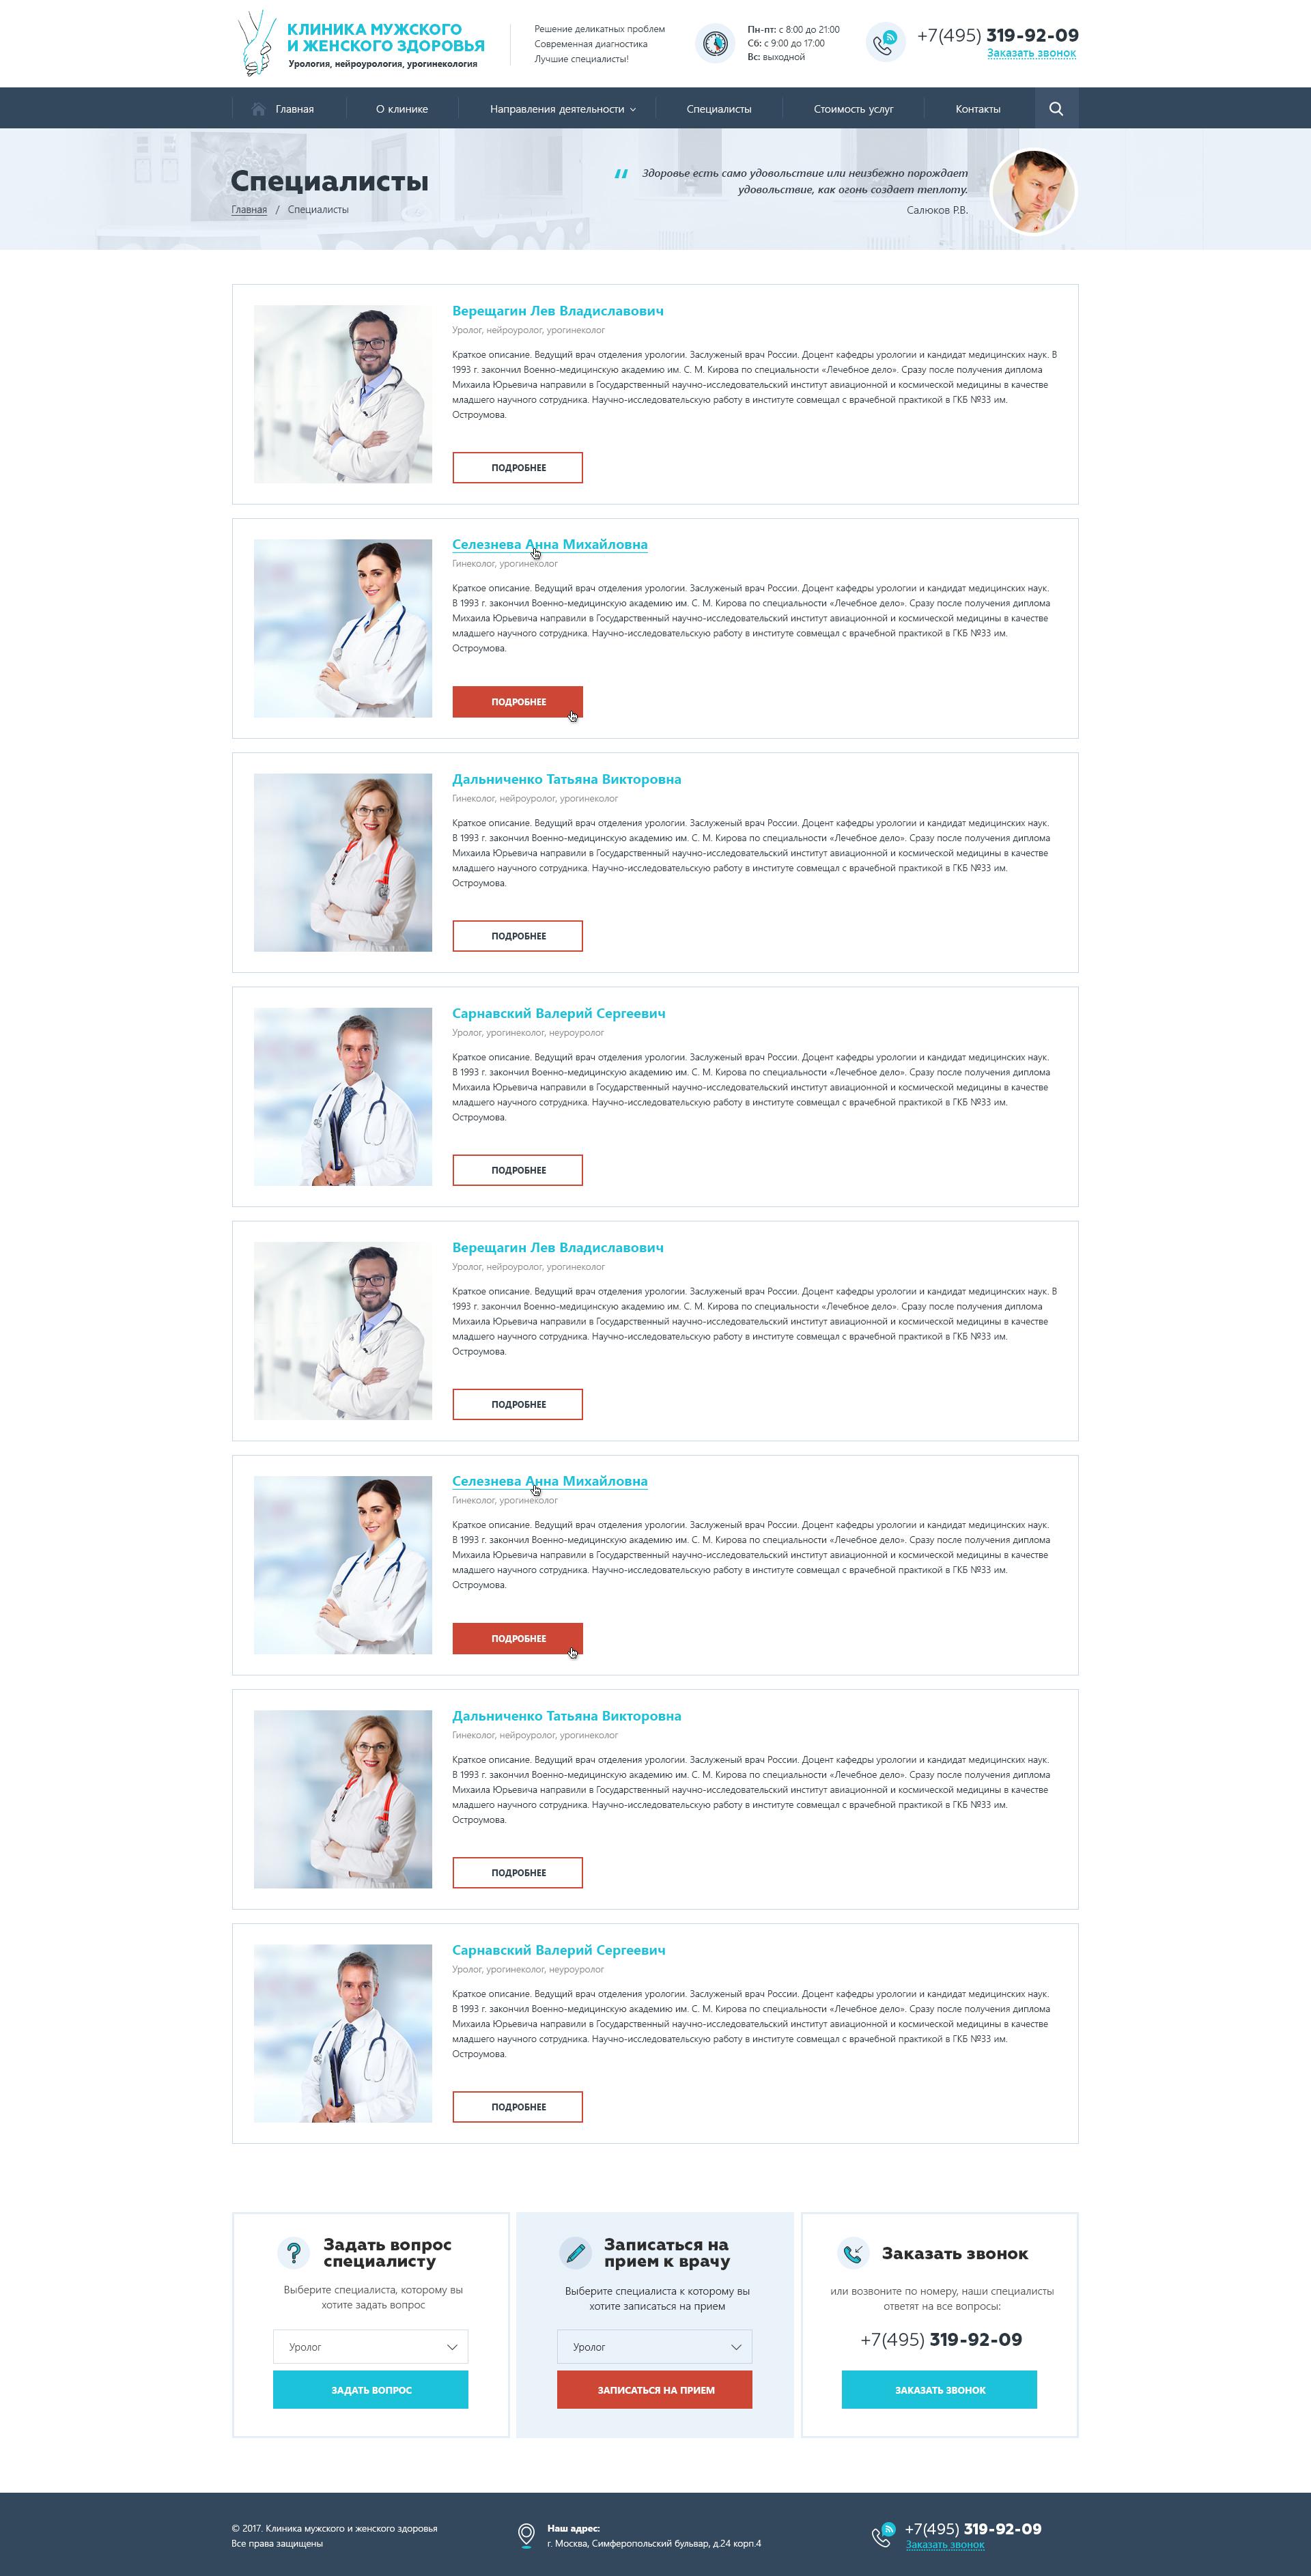 Neyroyrolog_specialisty2